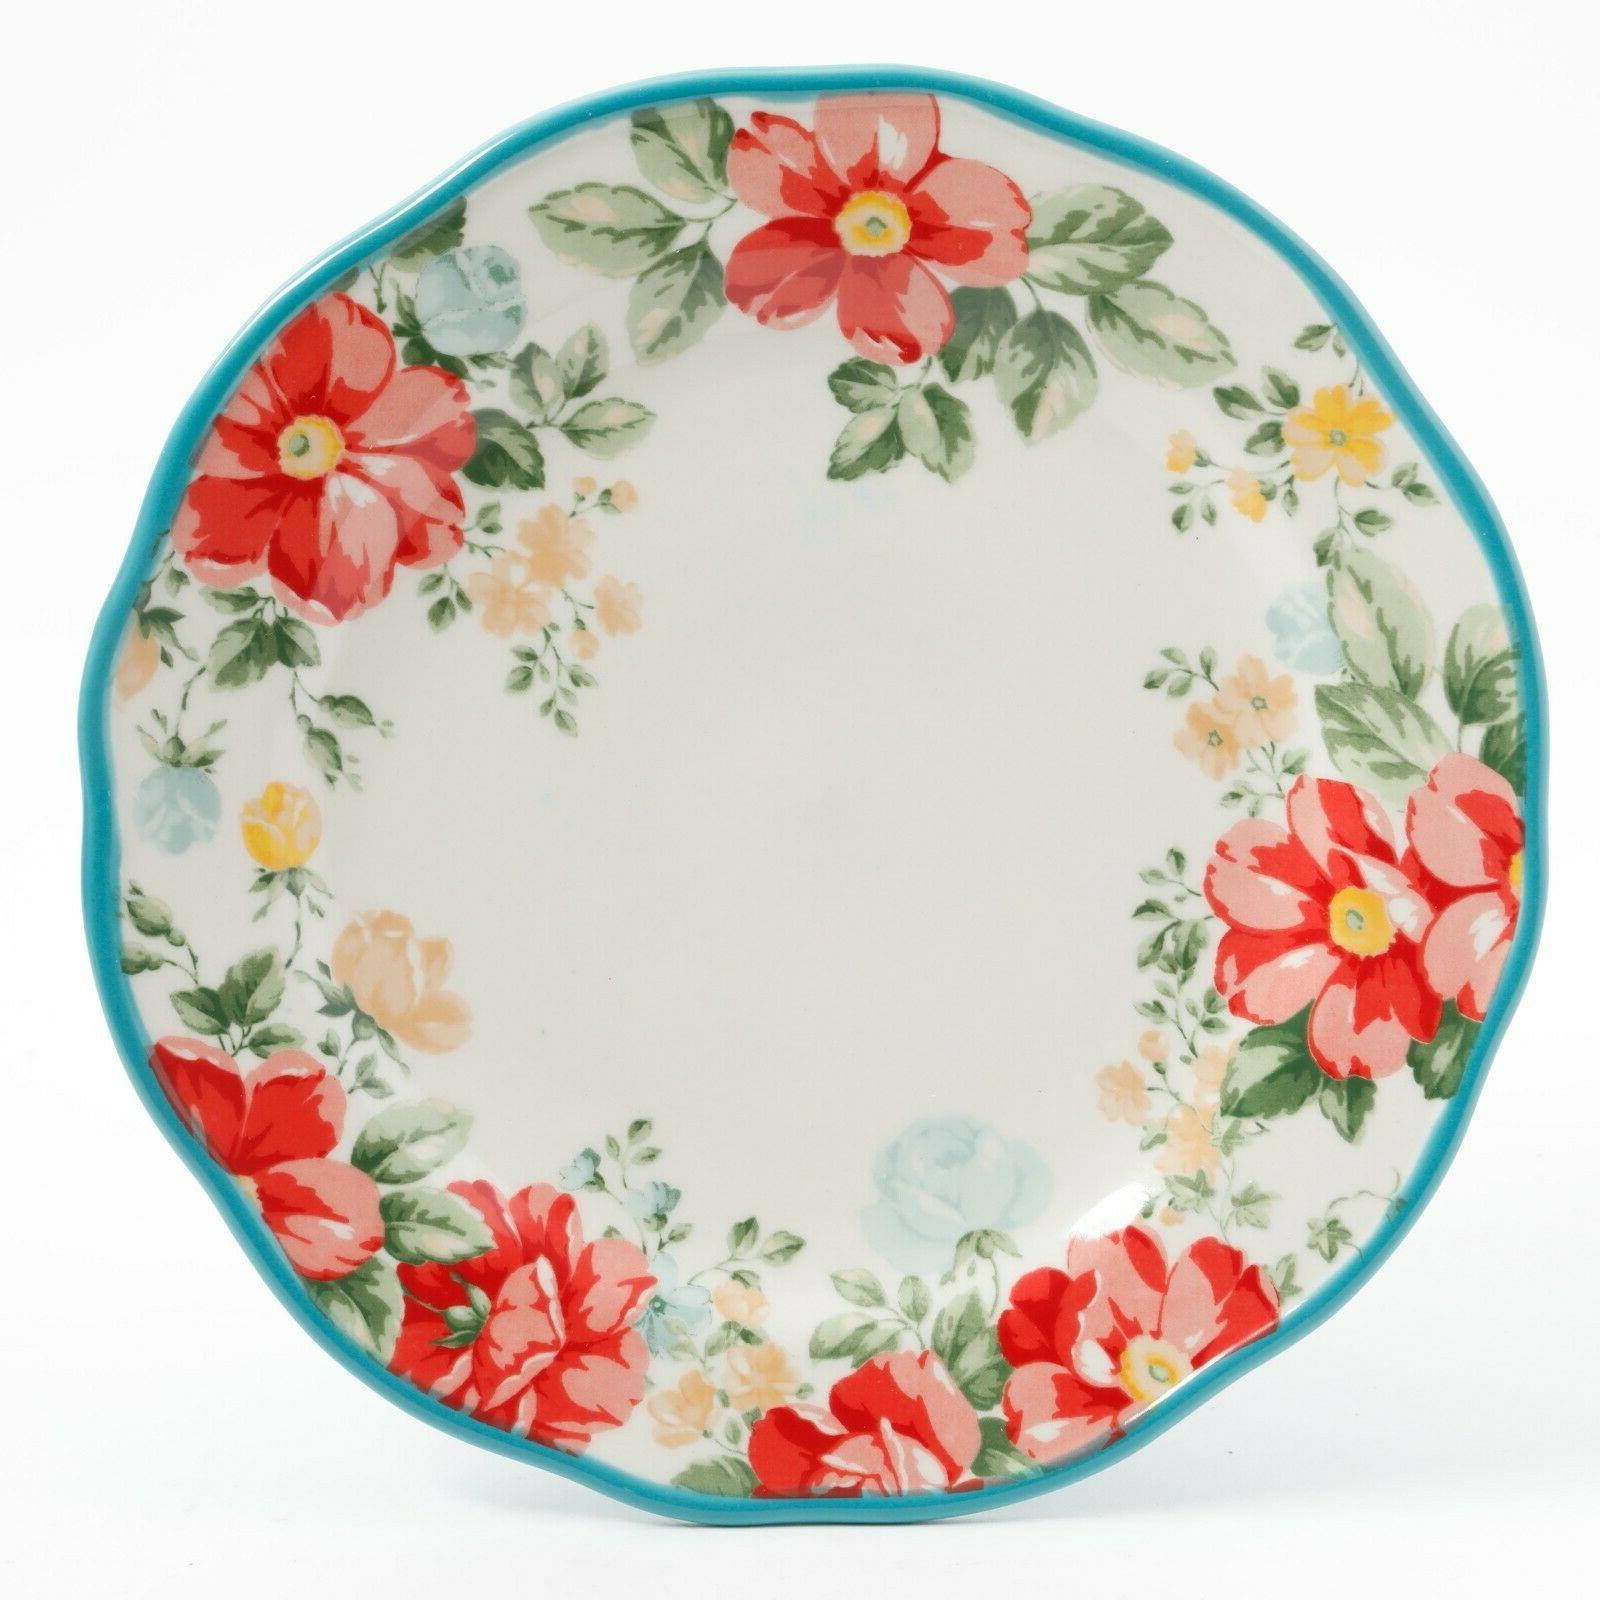 The Pioneer Woman Ruffle Floral Dinnerware 20